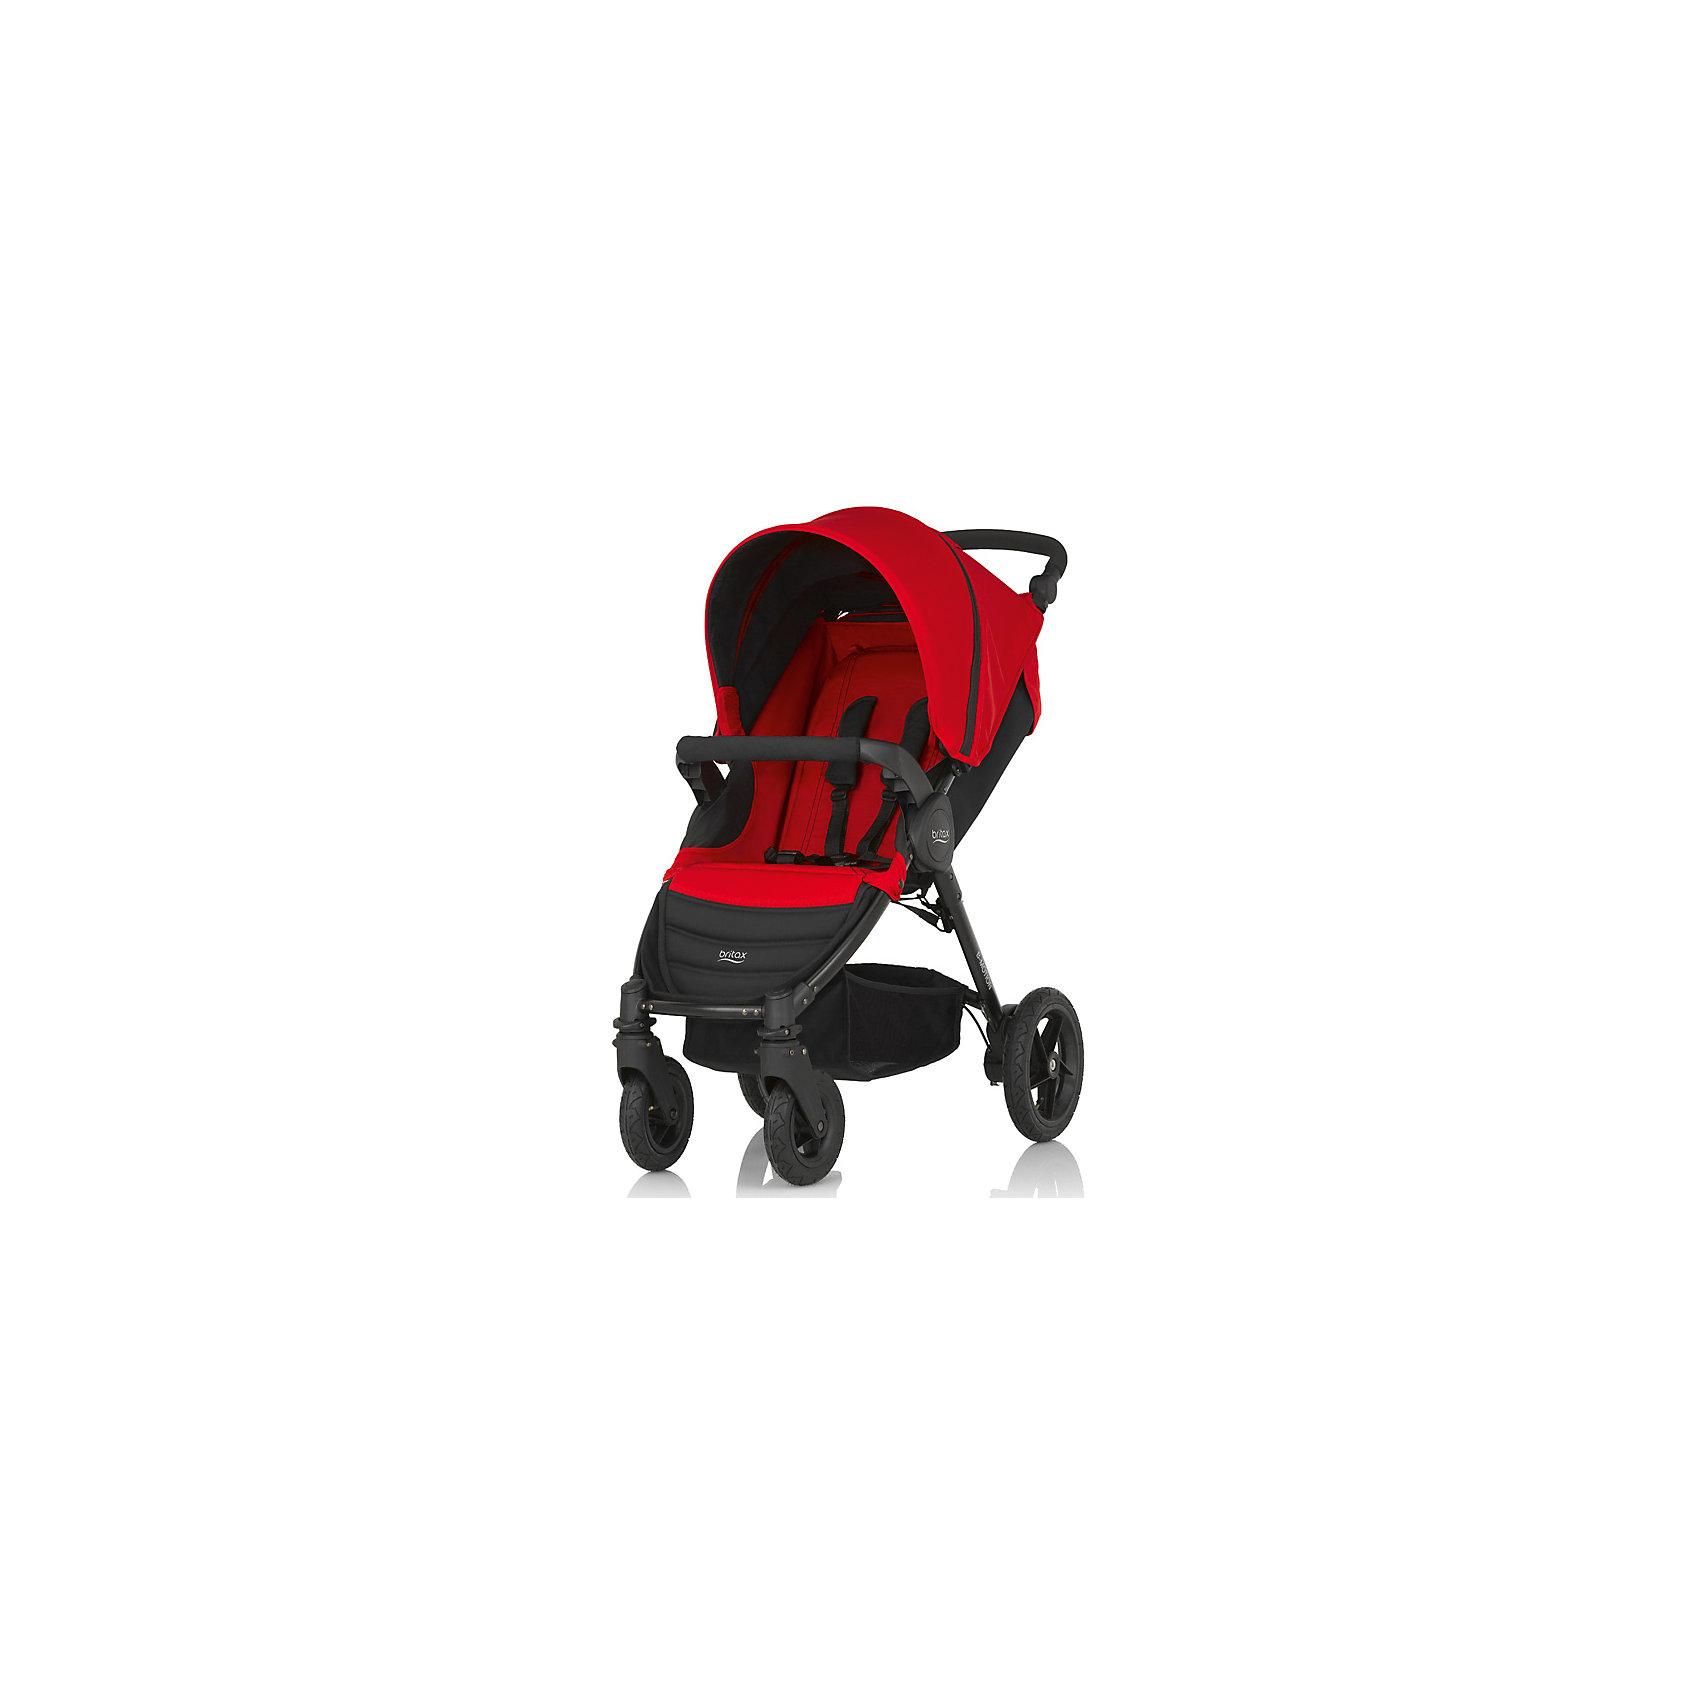 Прогулочная коляска Britax B-Motion 4, Flame Red